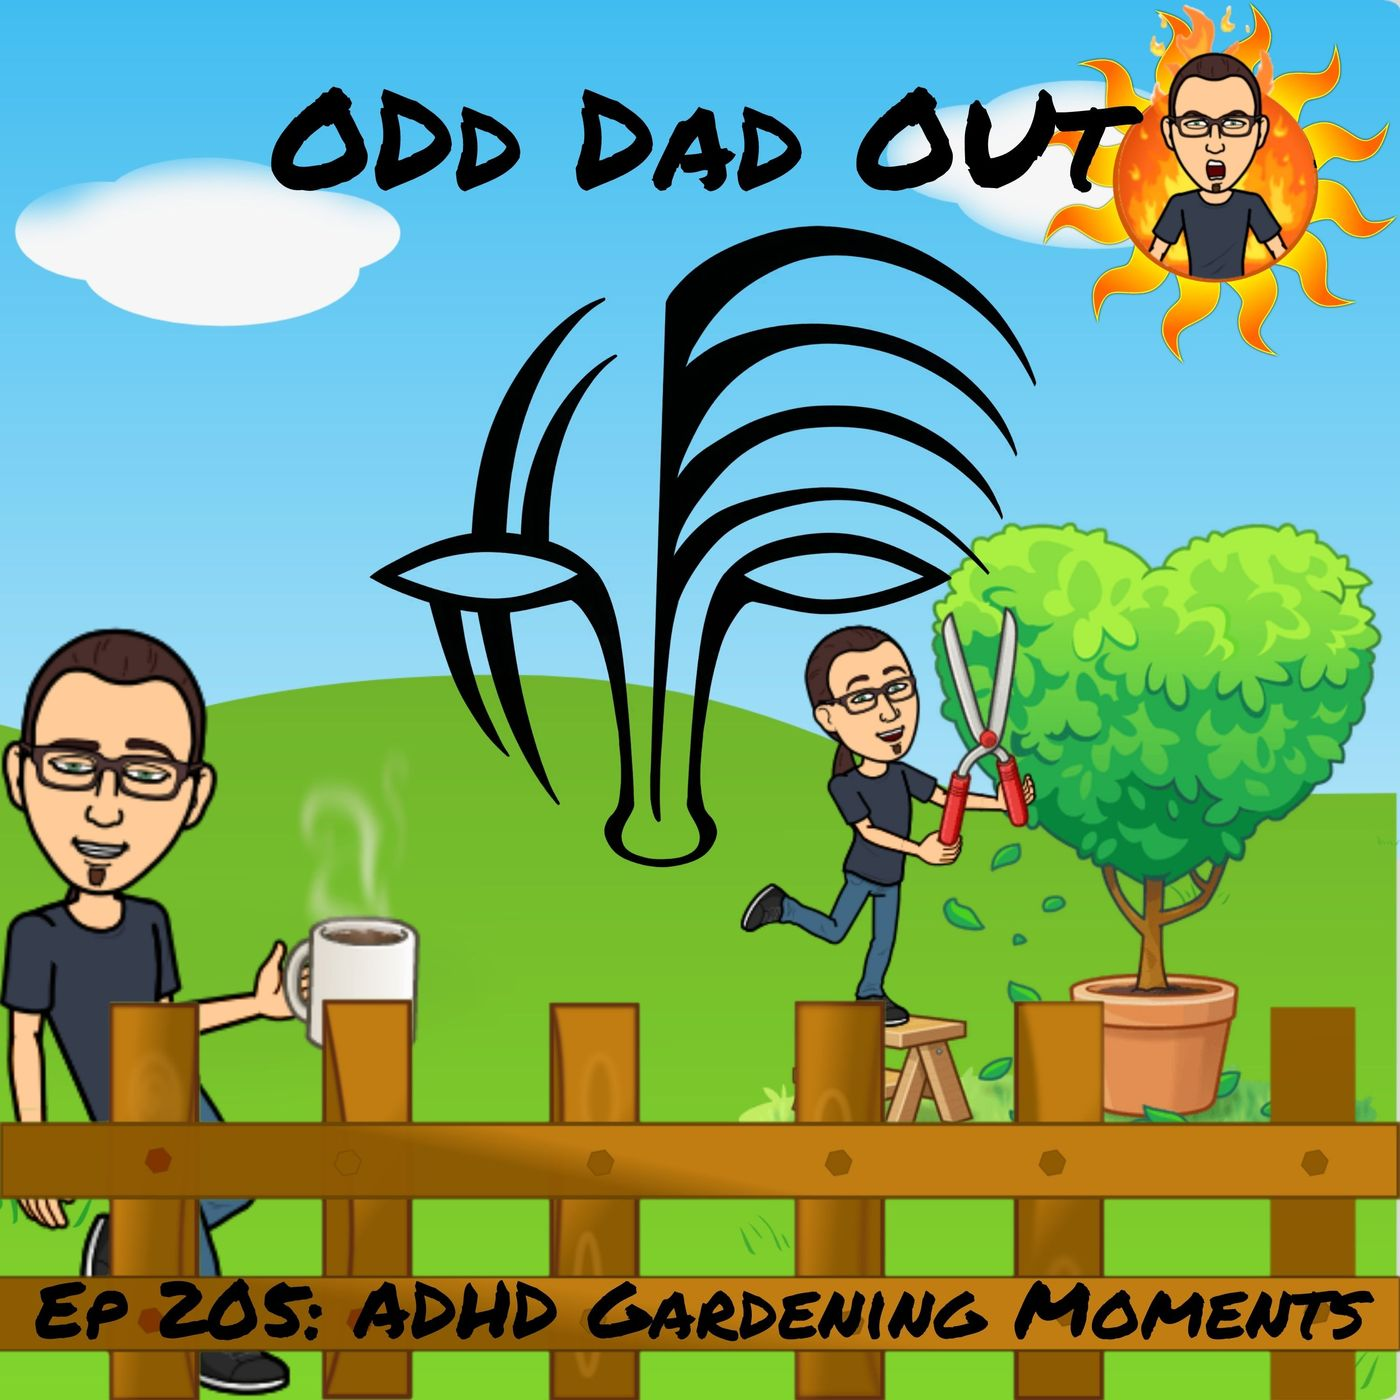 ADHD Gardening Moments: ODO 205